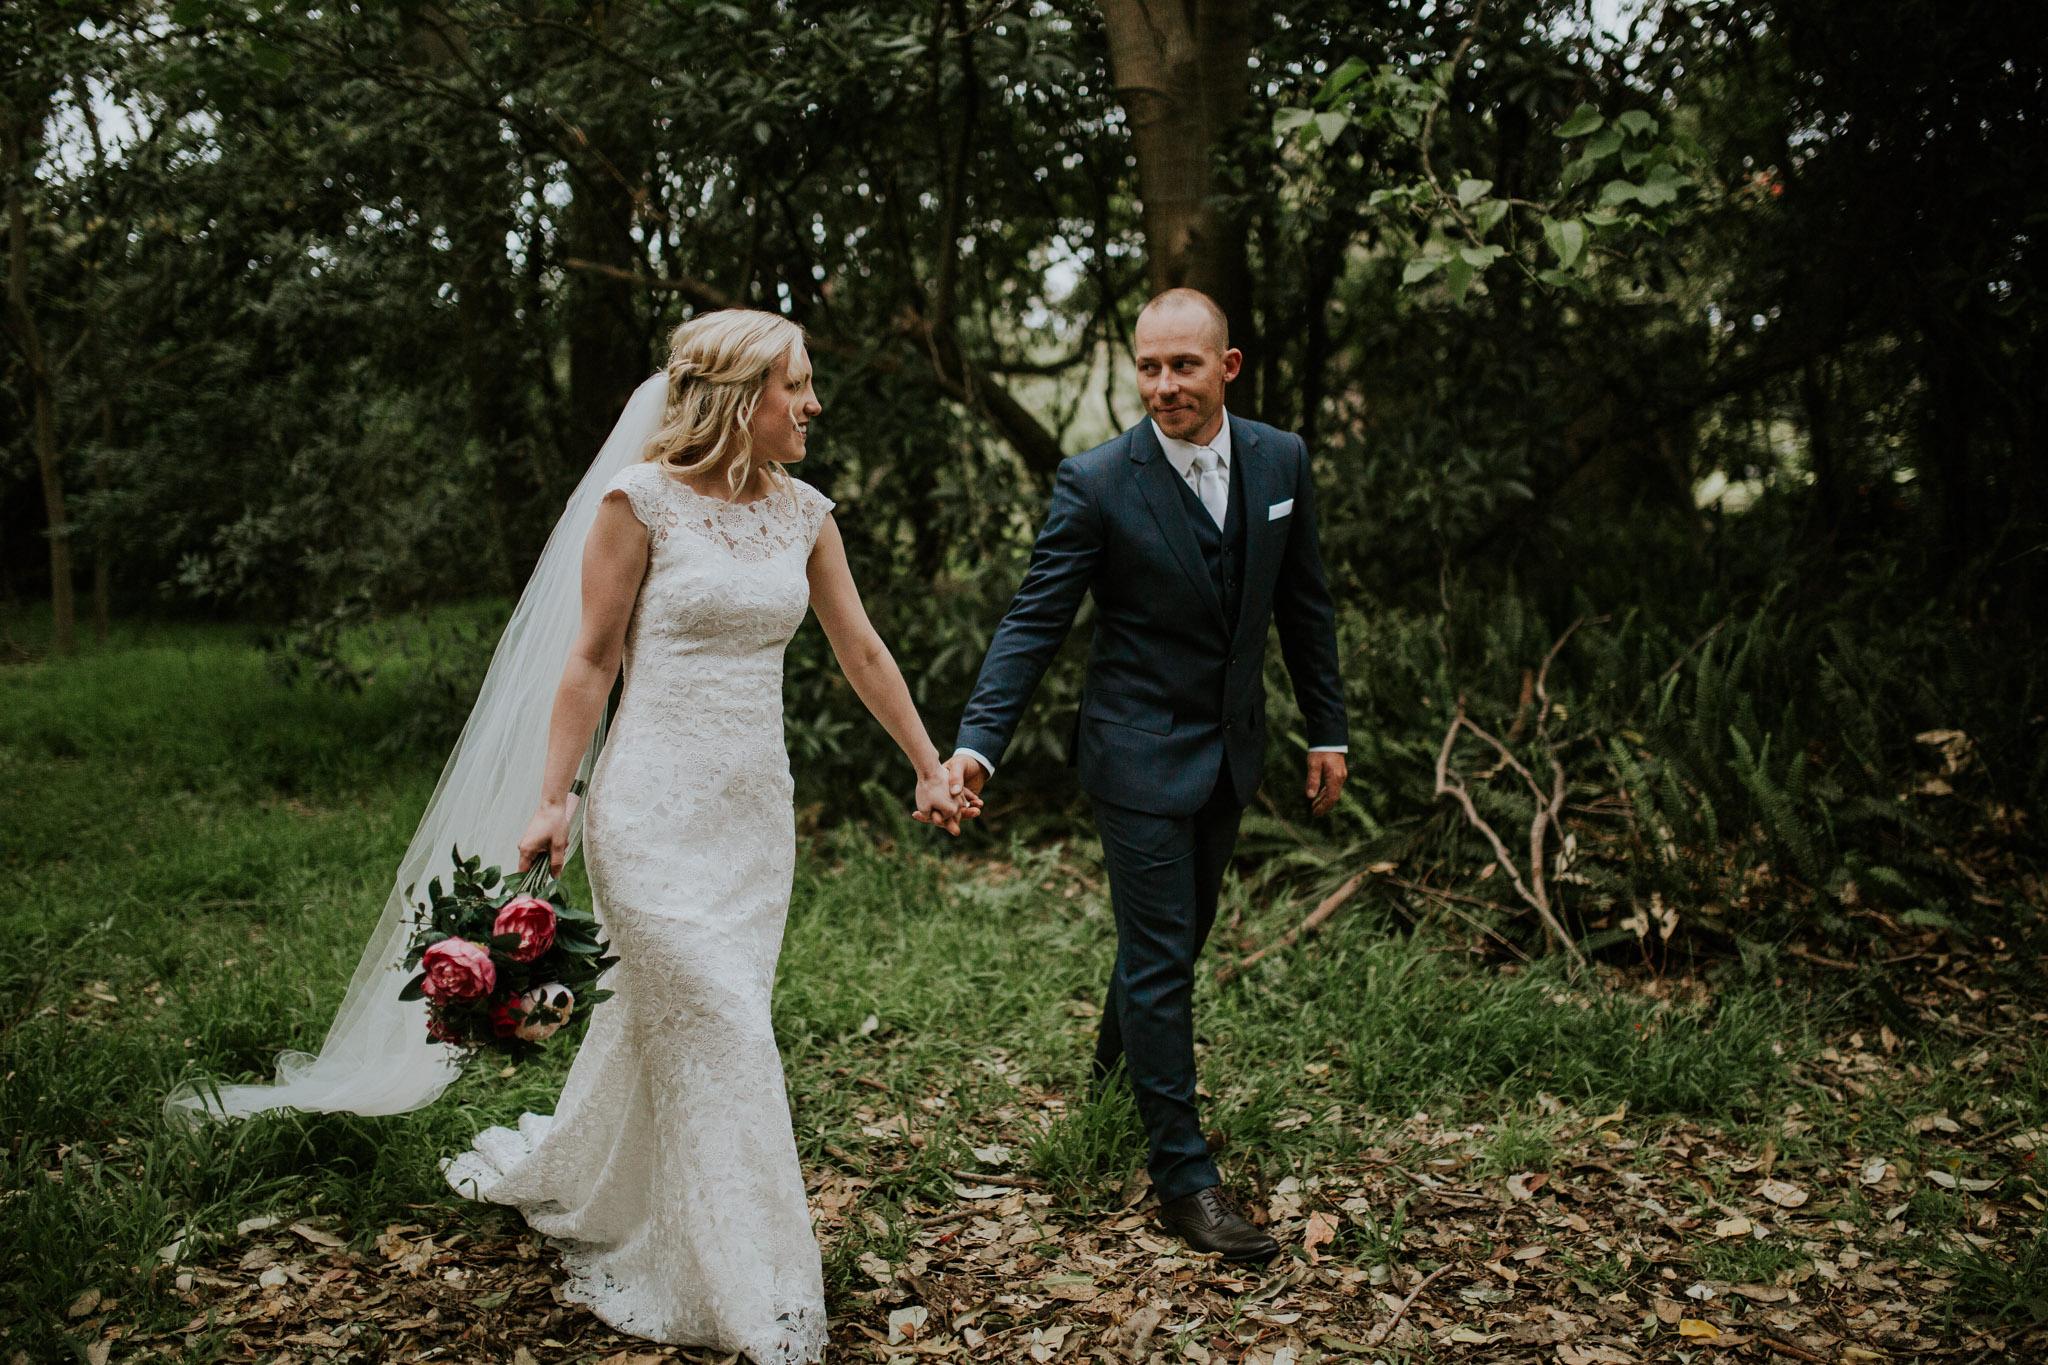 Shanan & Traci_Portkembla Golf Course Wedding-54.jpg